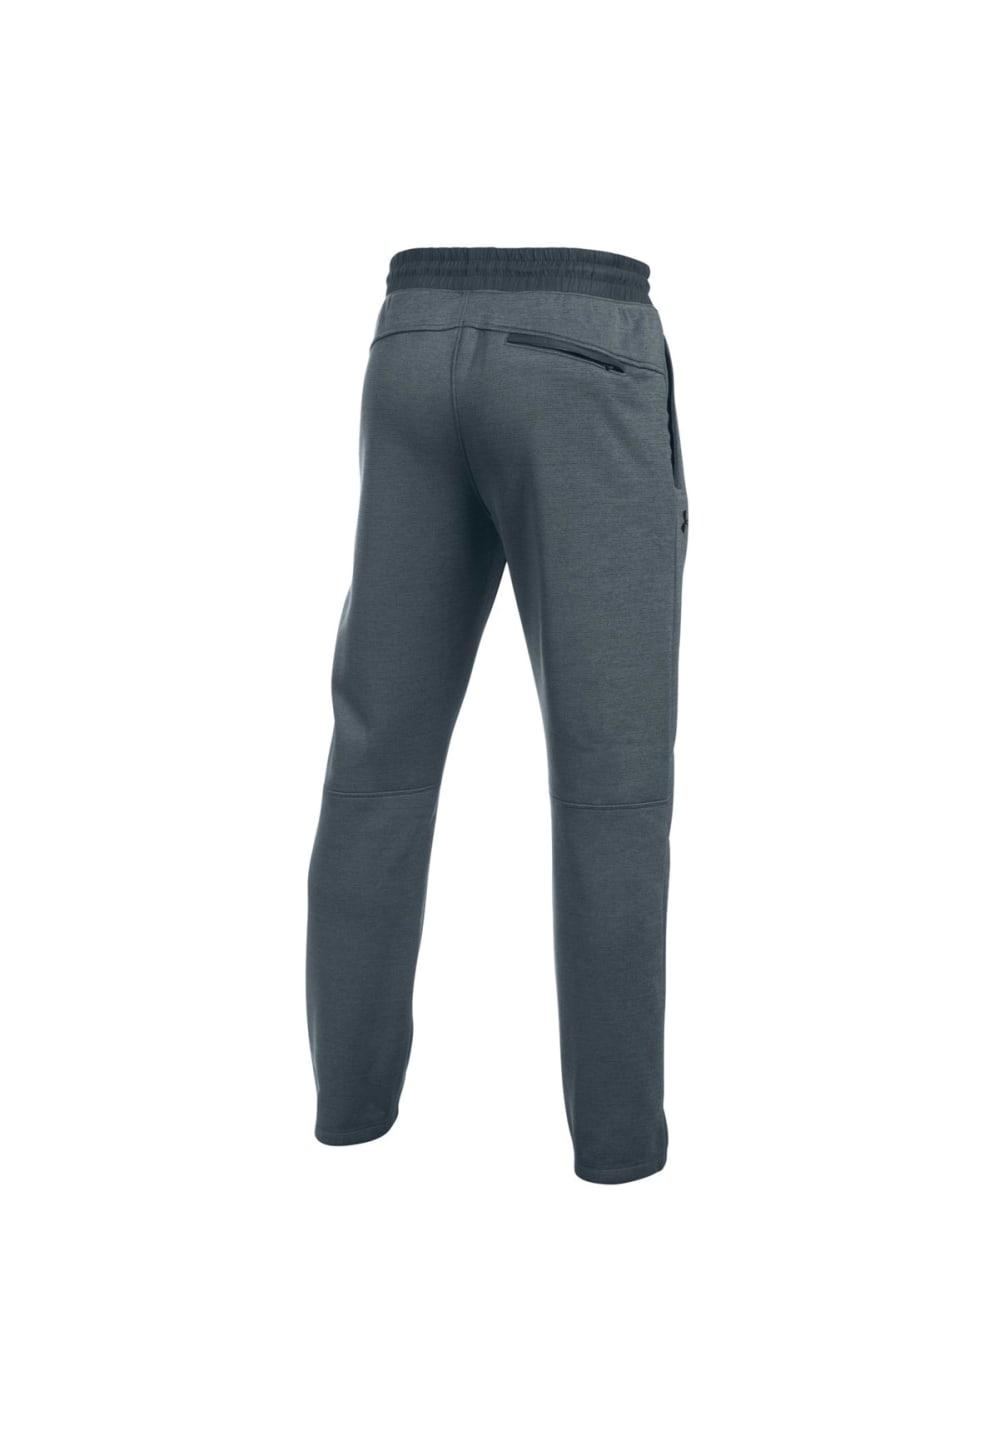 under armour storm pants grey men